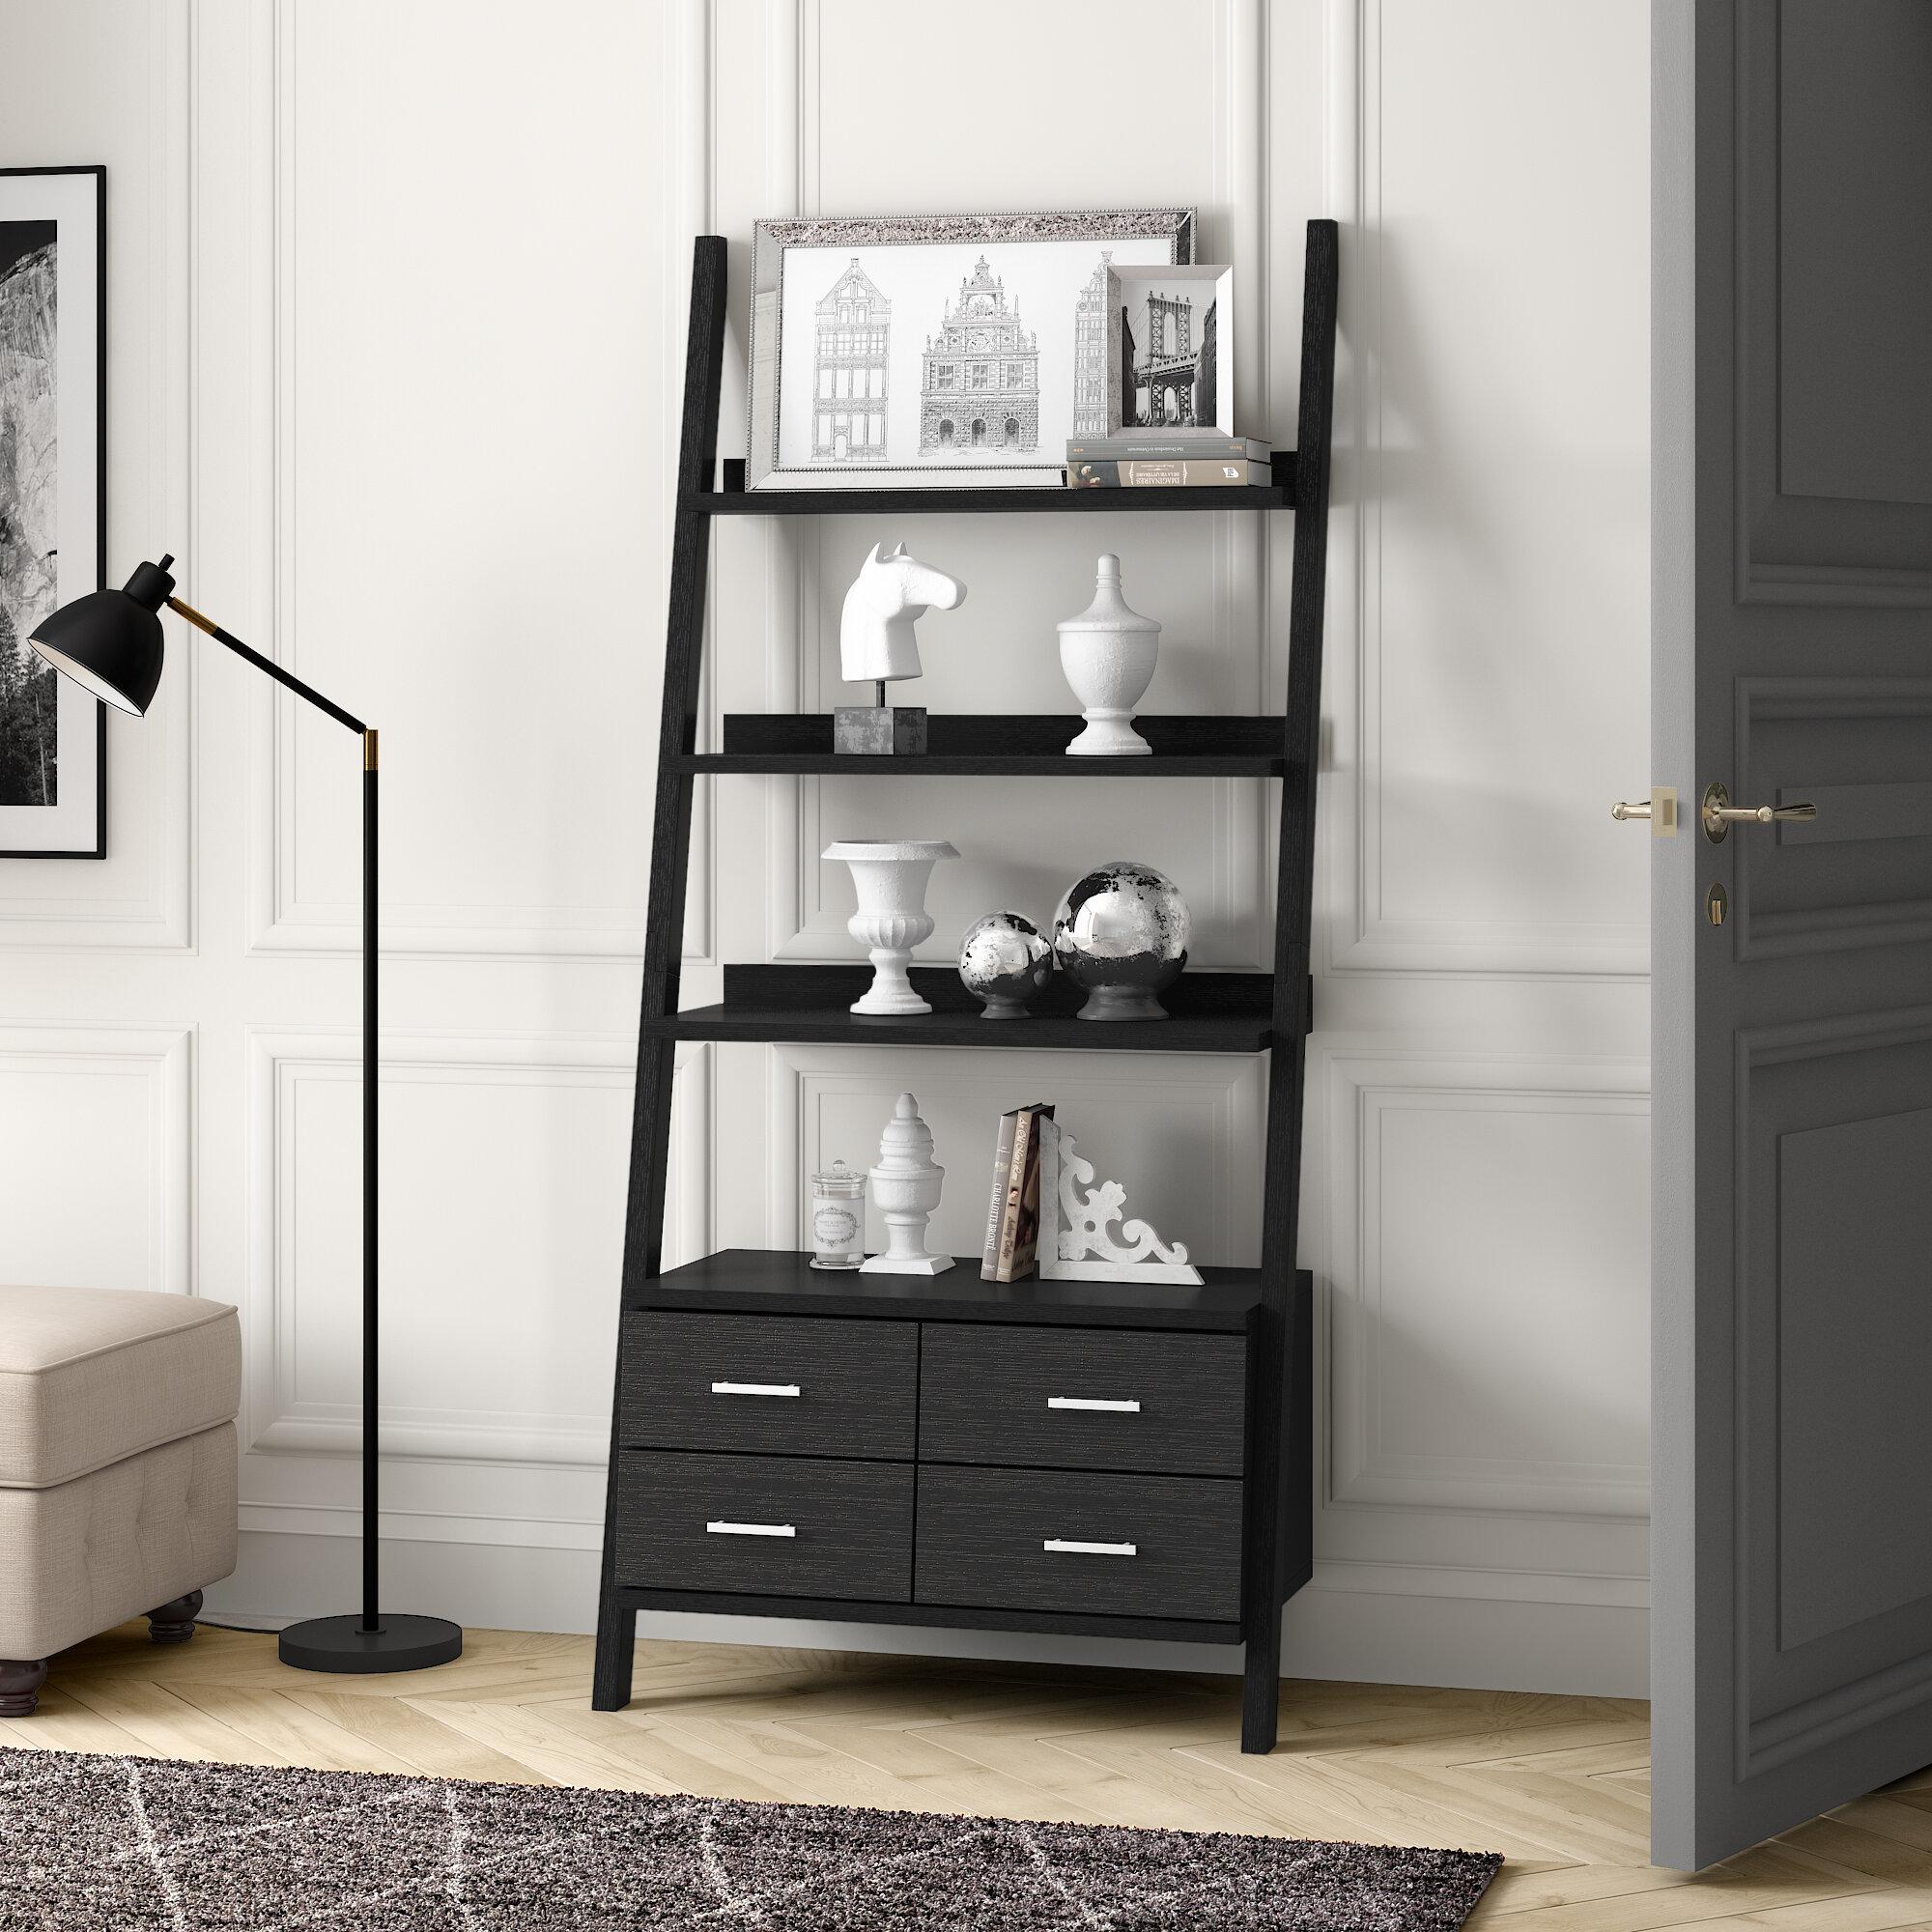 Mccaffery Quirky Ladder Bookcase